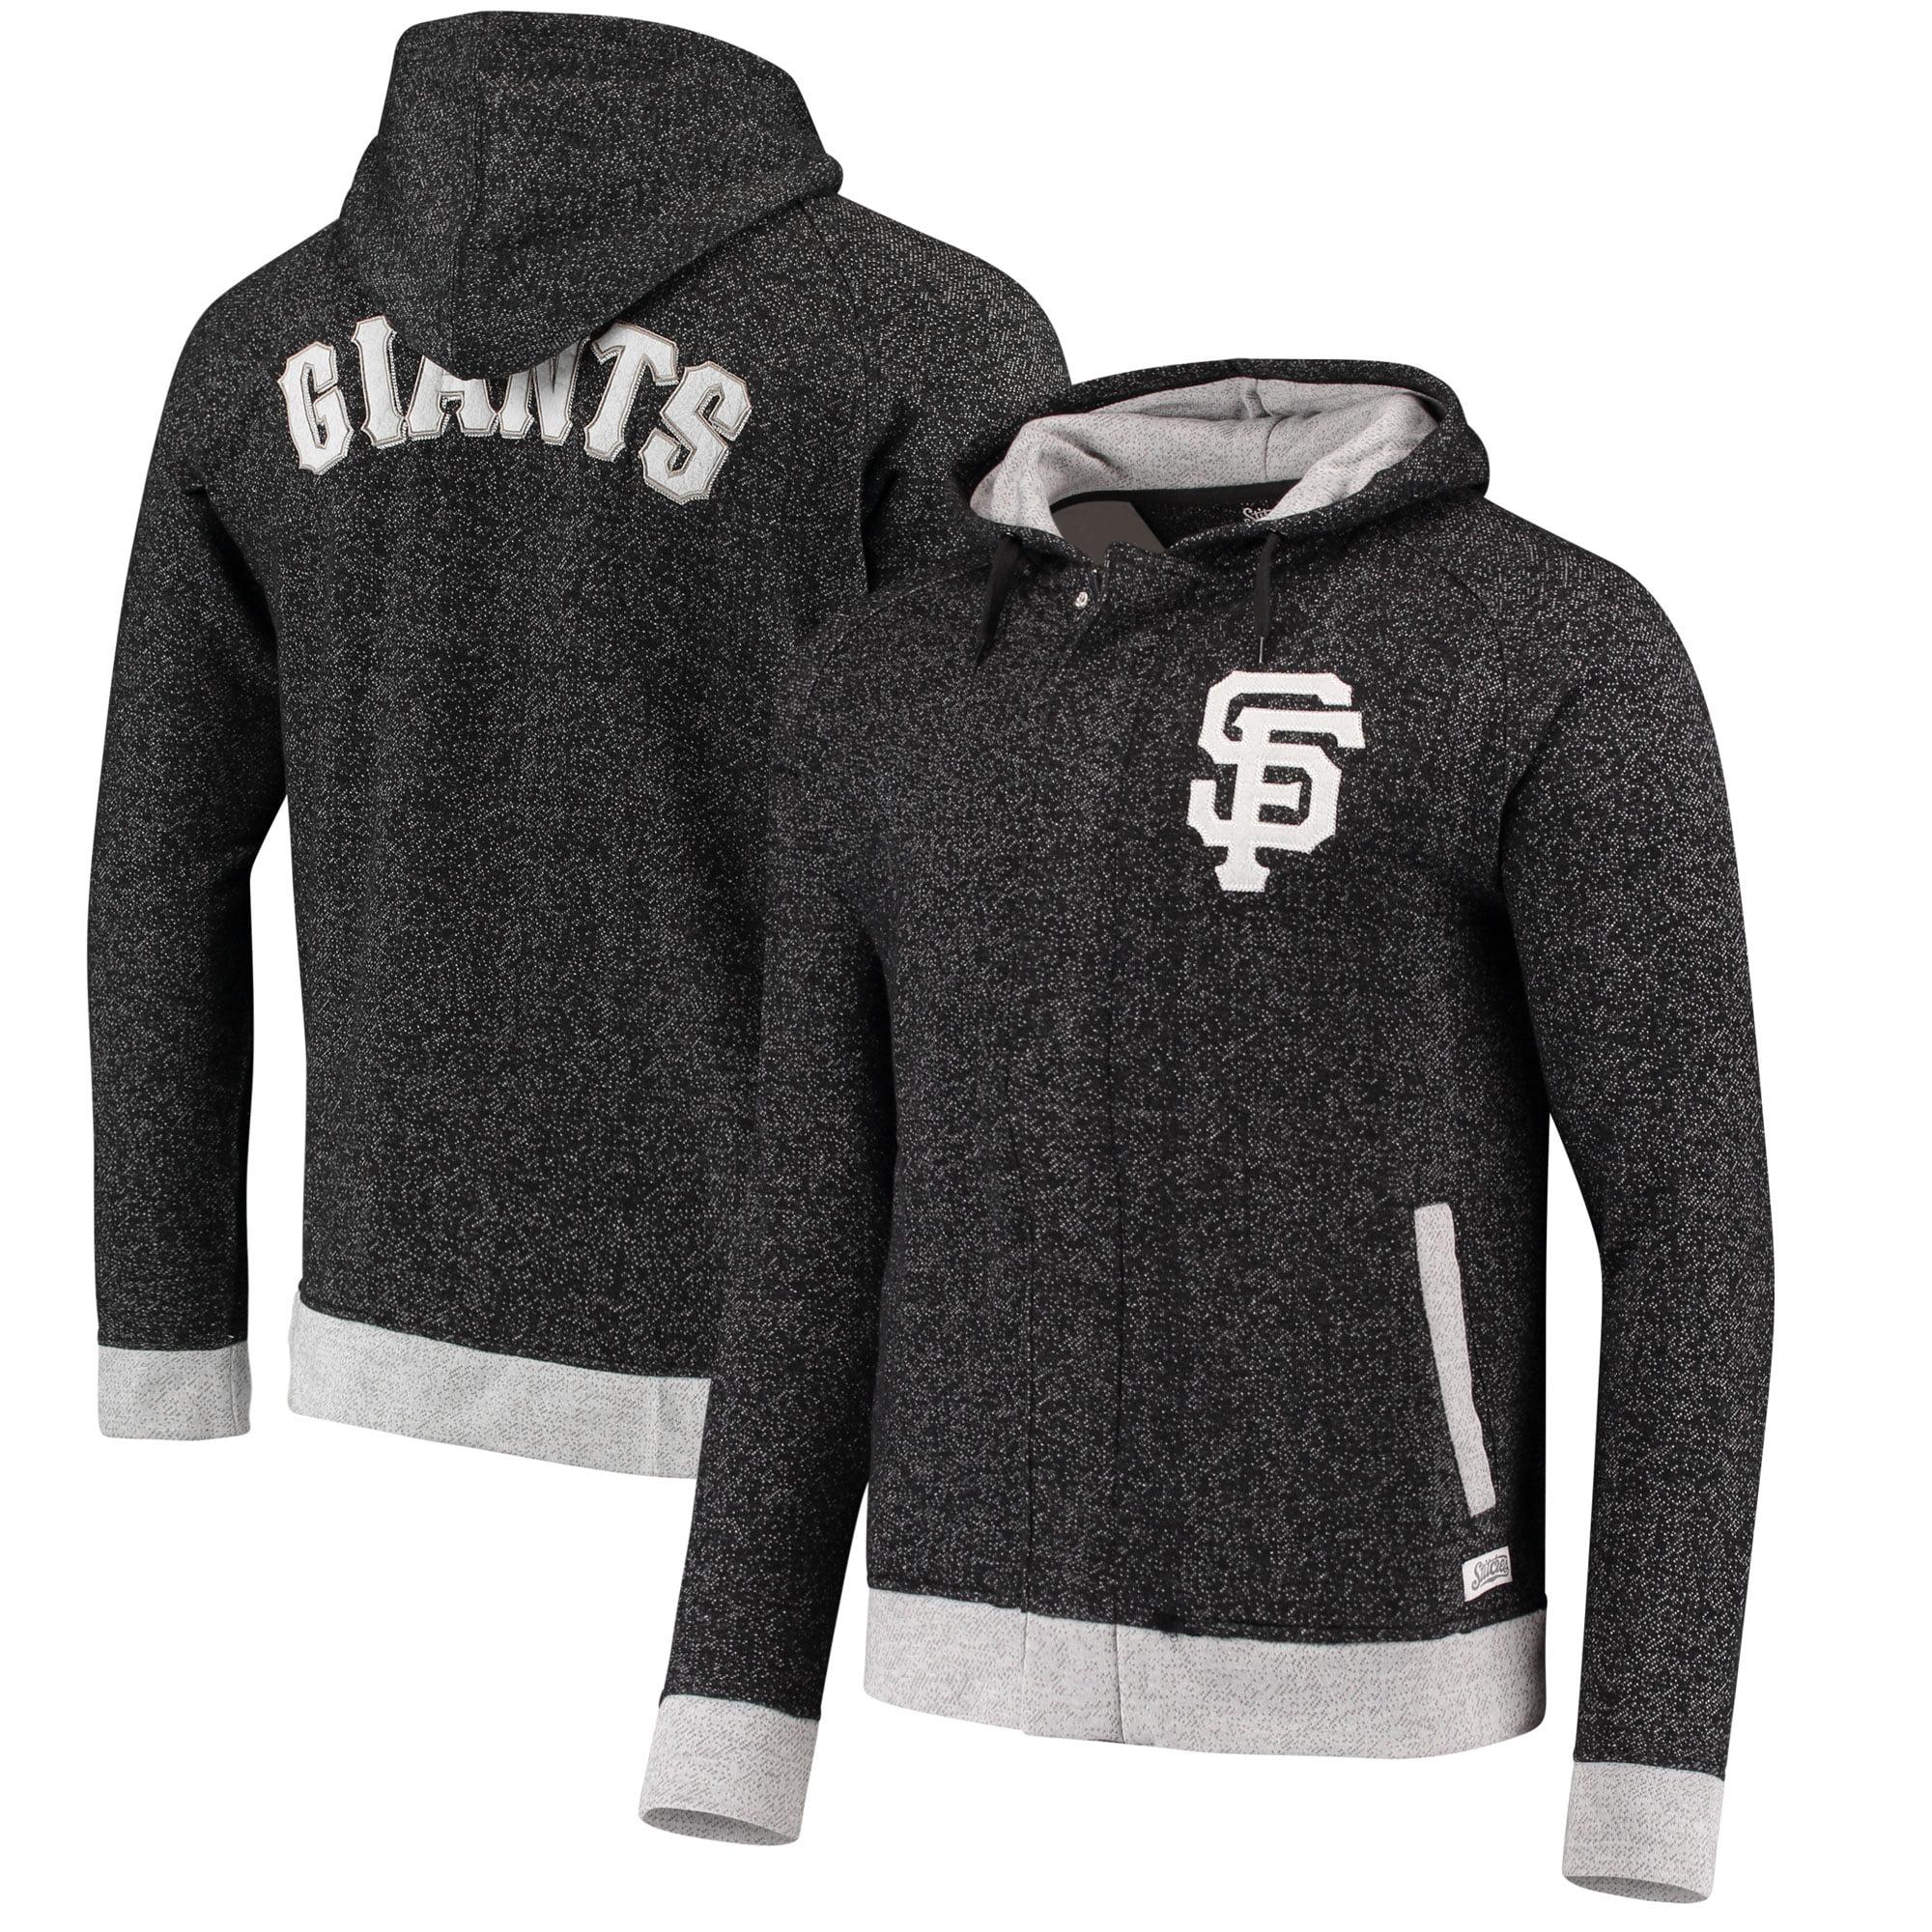 San Francisco Giants Stitches Twisted Yarn Full-Zip Hoodie - Black/Natural